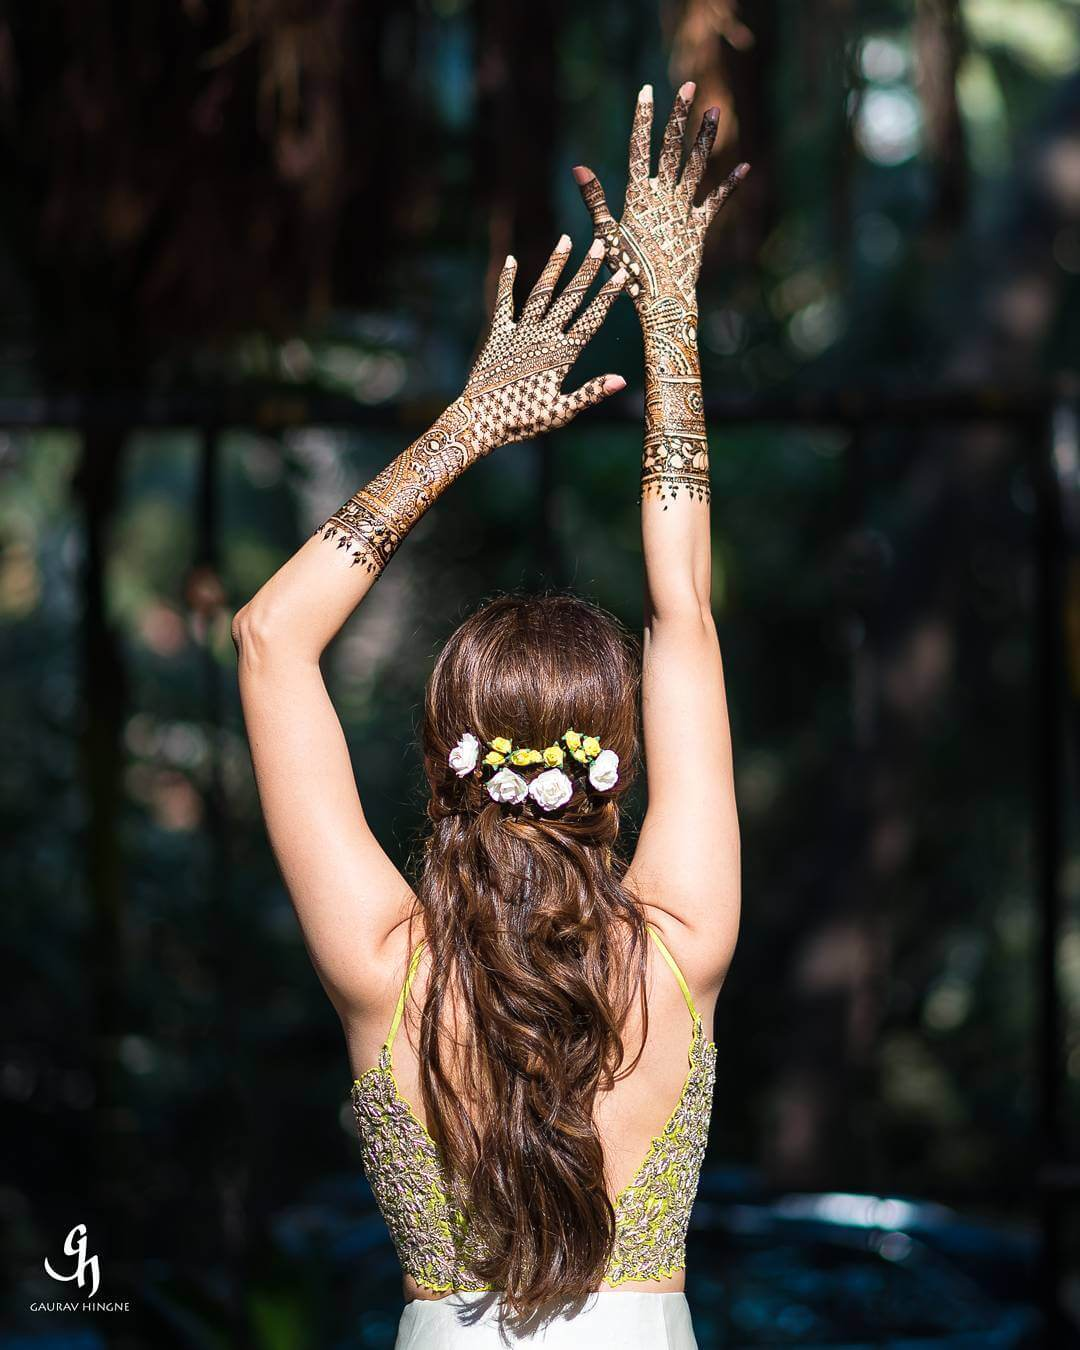 20+ Fun Bridal Mehndi Poses You Wouldn't Want to Miss!